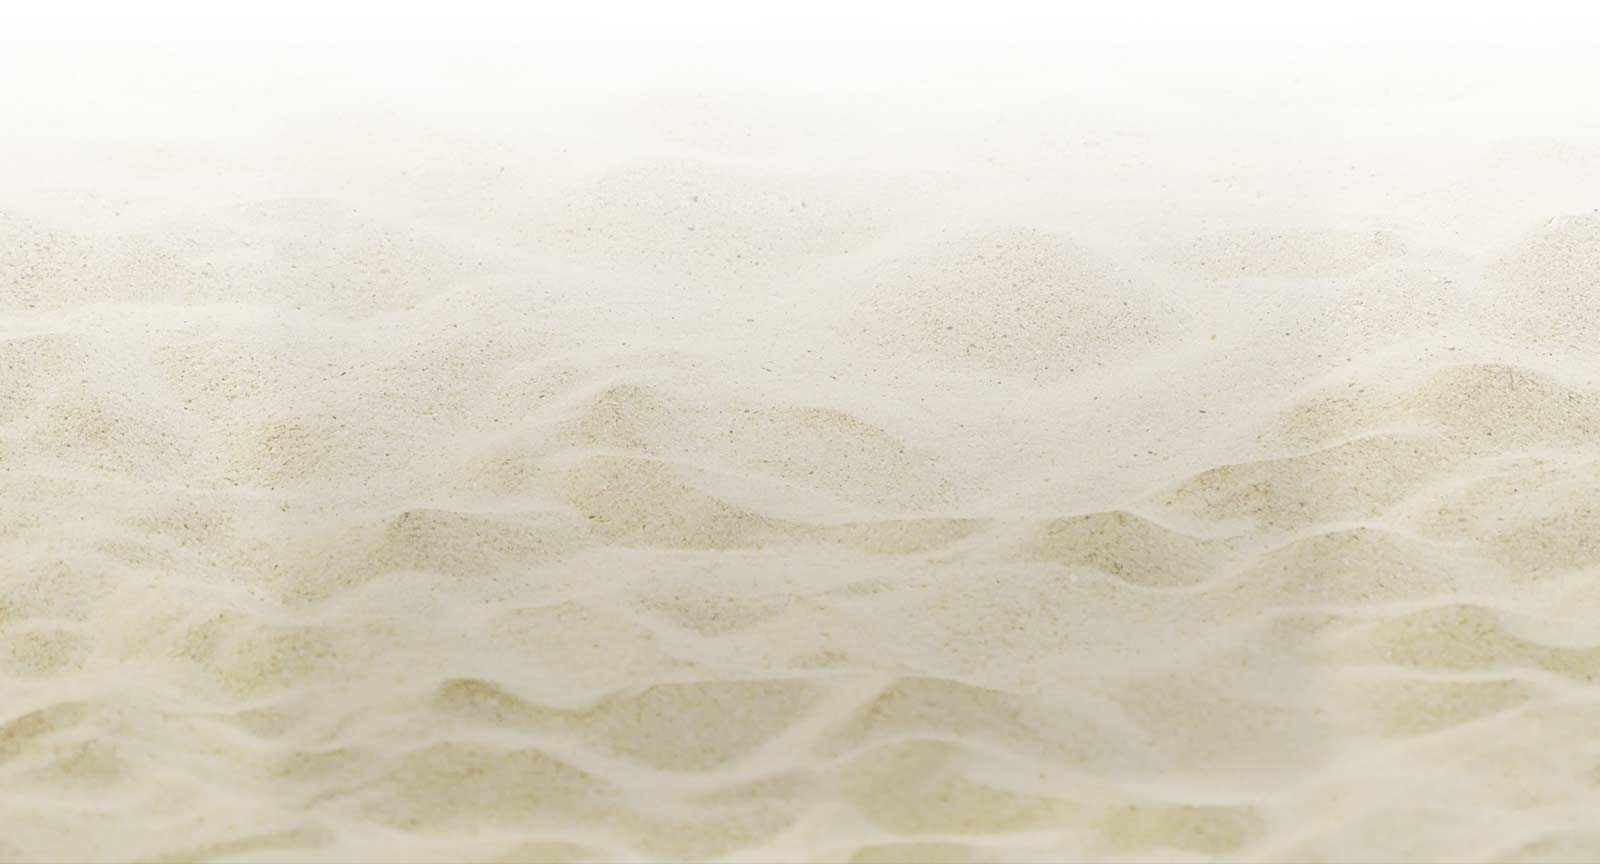 http://static.tumblr.com/b2288d6986c96951b4db52b73ecd1789/ttak5mp/LcZn1okbi/tumblr_static_sand_background.jpg